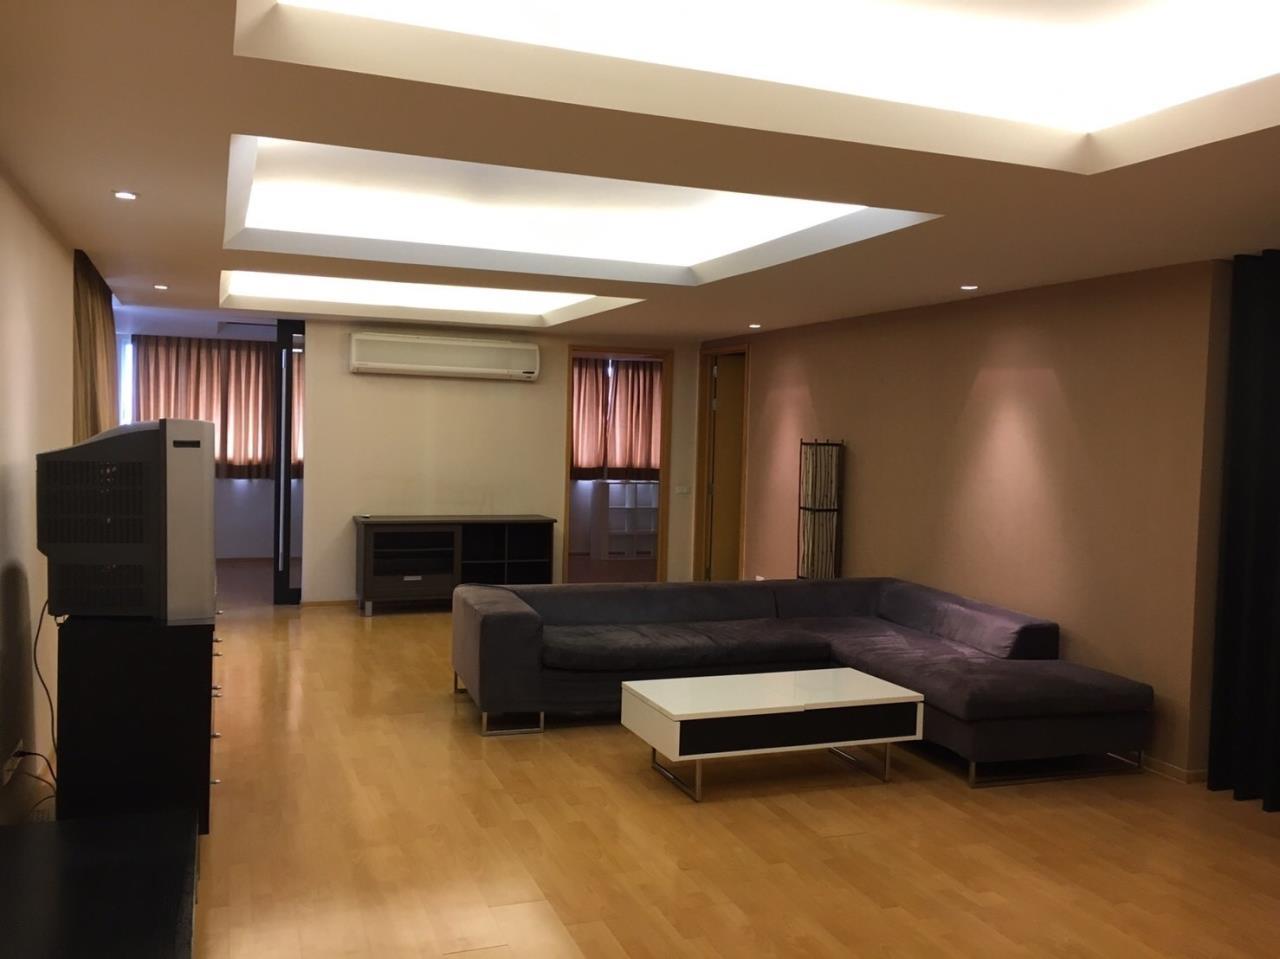 Piri Property Agency's Duplex Penthouse with 4 Bedrooms in Ekkamai - 27th Floor 2